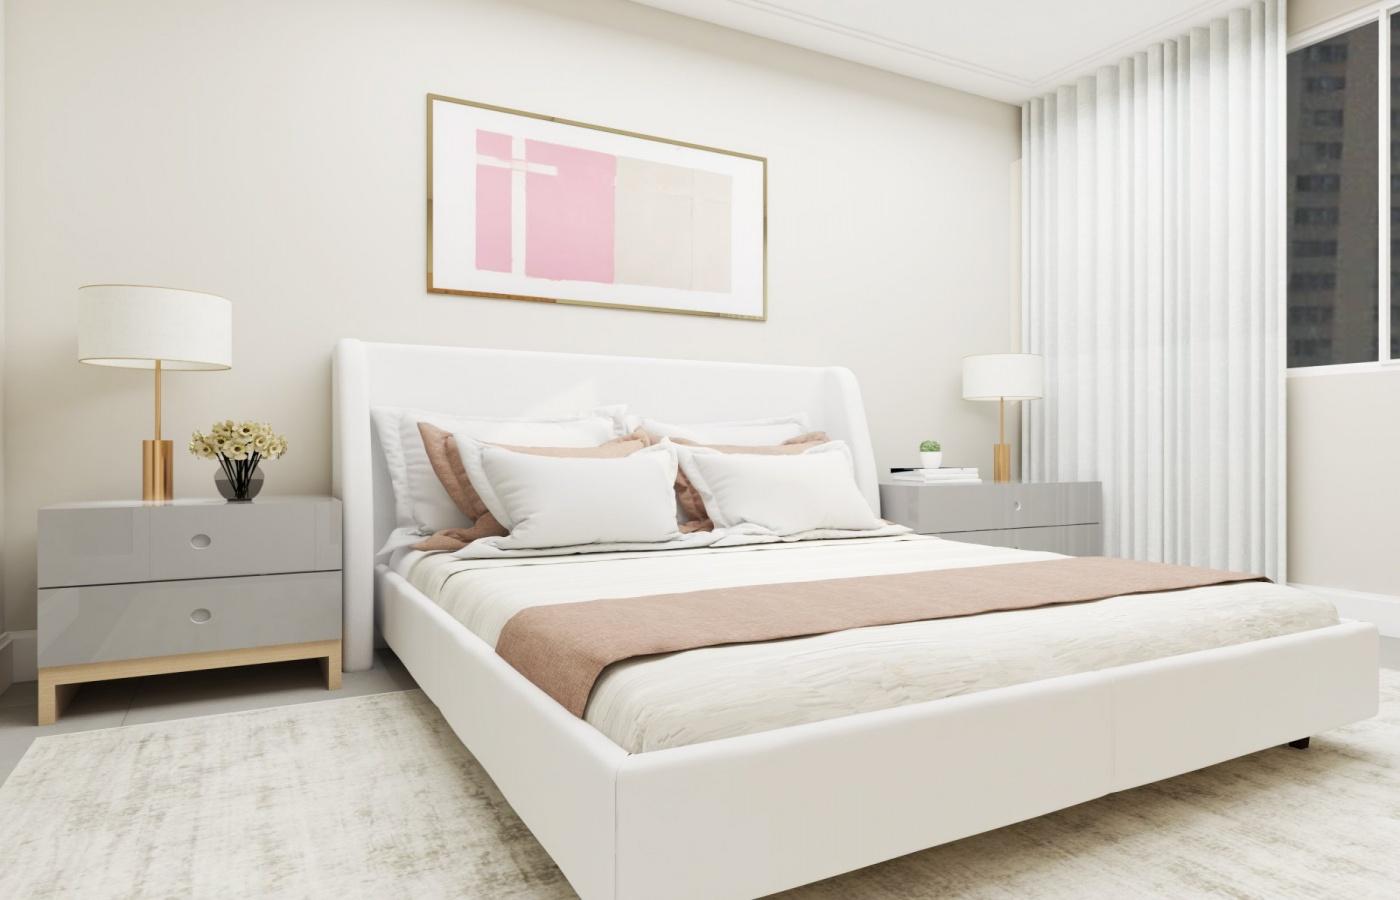 265 Rua Doutor Melo Alves, 01417-010, São Paulo, 2 Bedrooms Bedrooms, ,2 BathroomsBathrooms,Apartamento,Vendas,Rua Doutor Melo Alves,7,1028